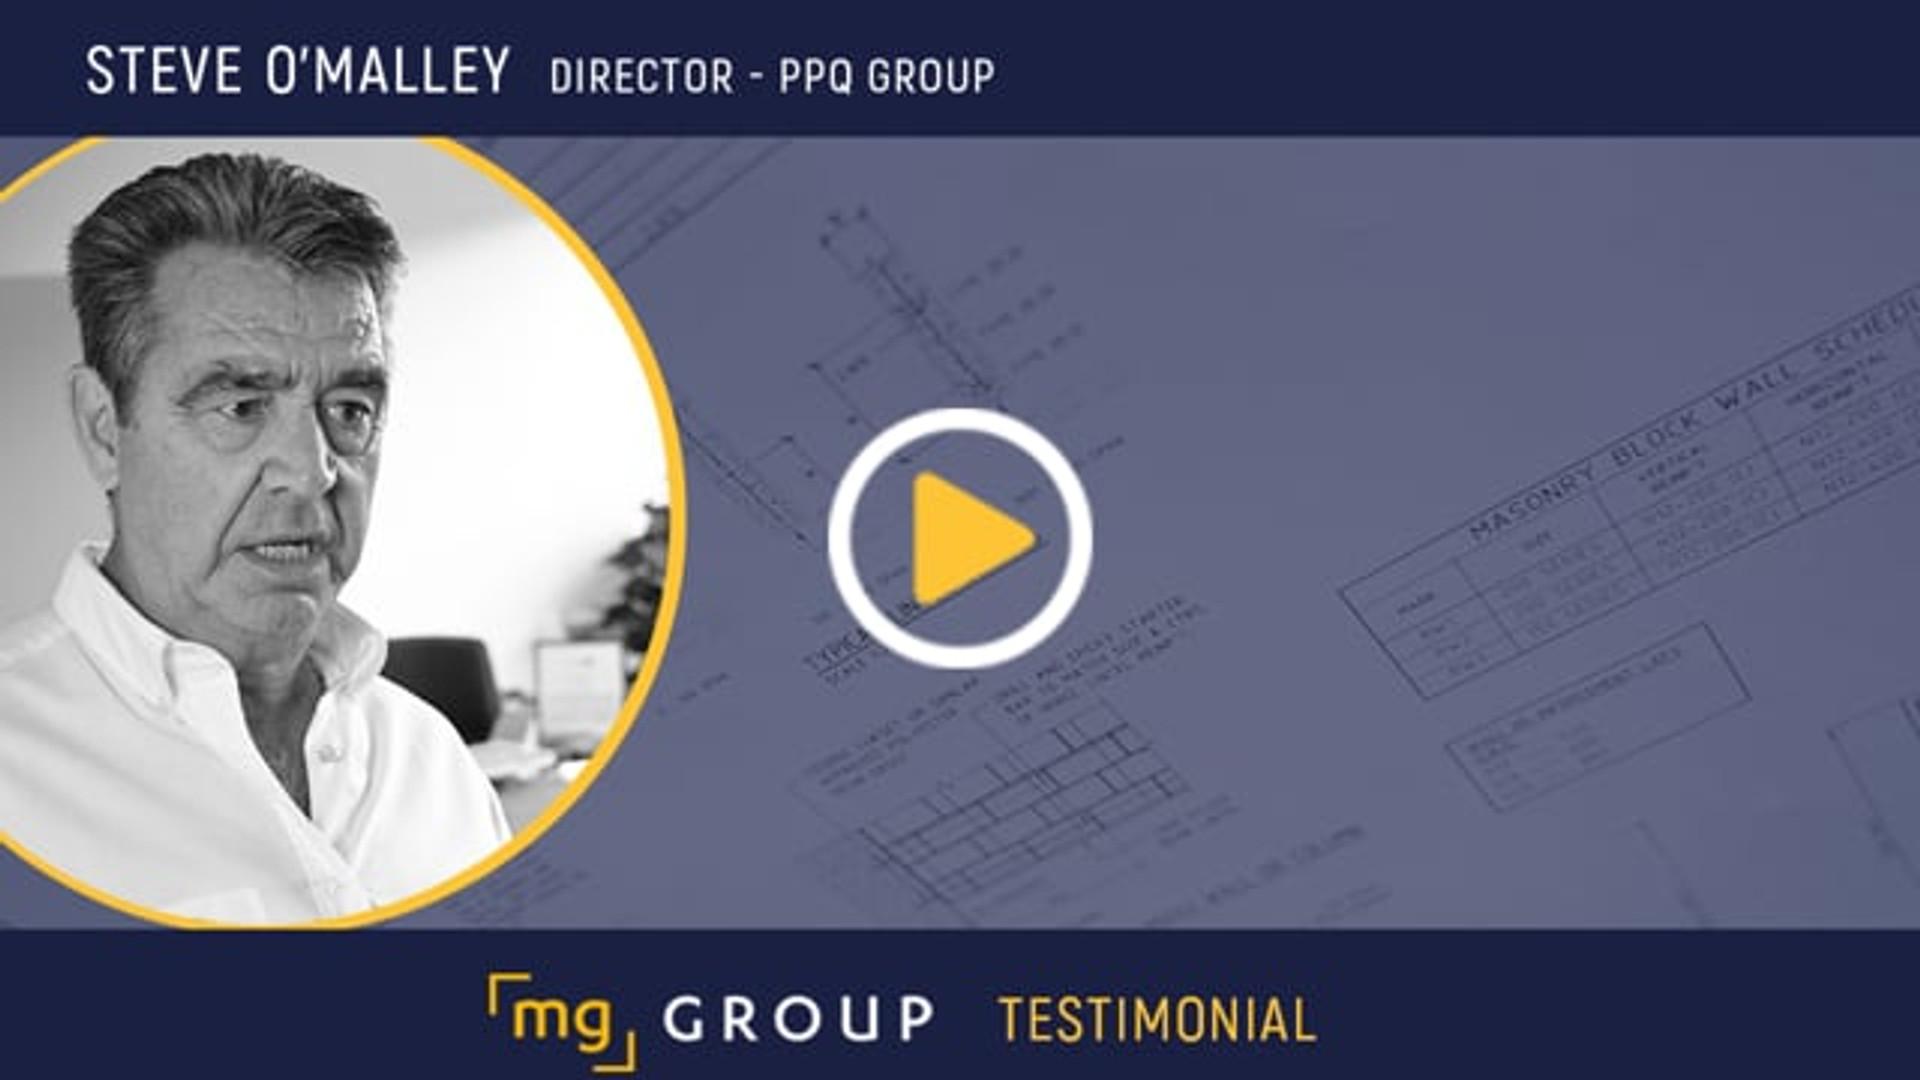 PPQ Group Testimonial